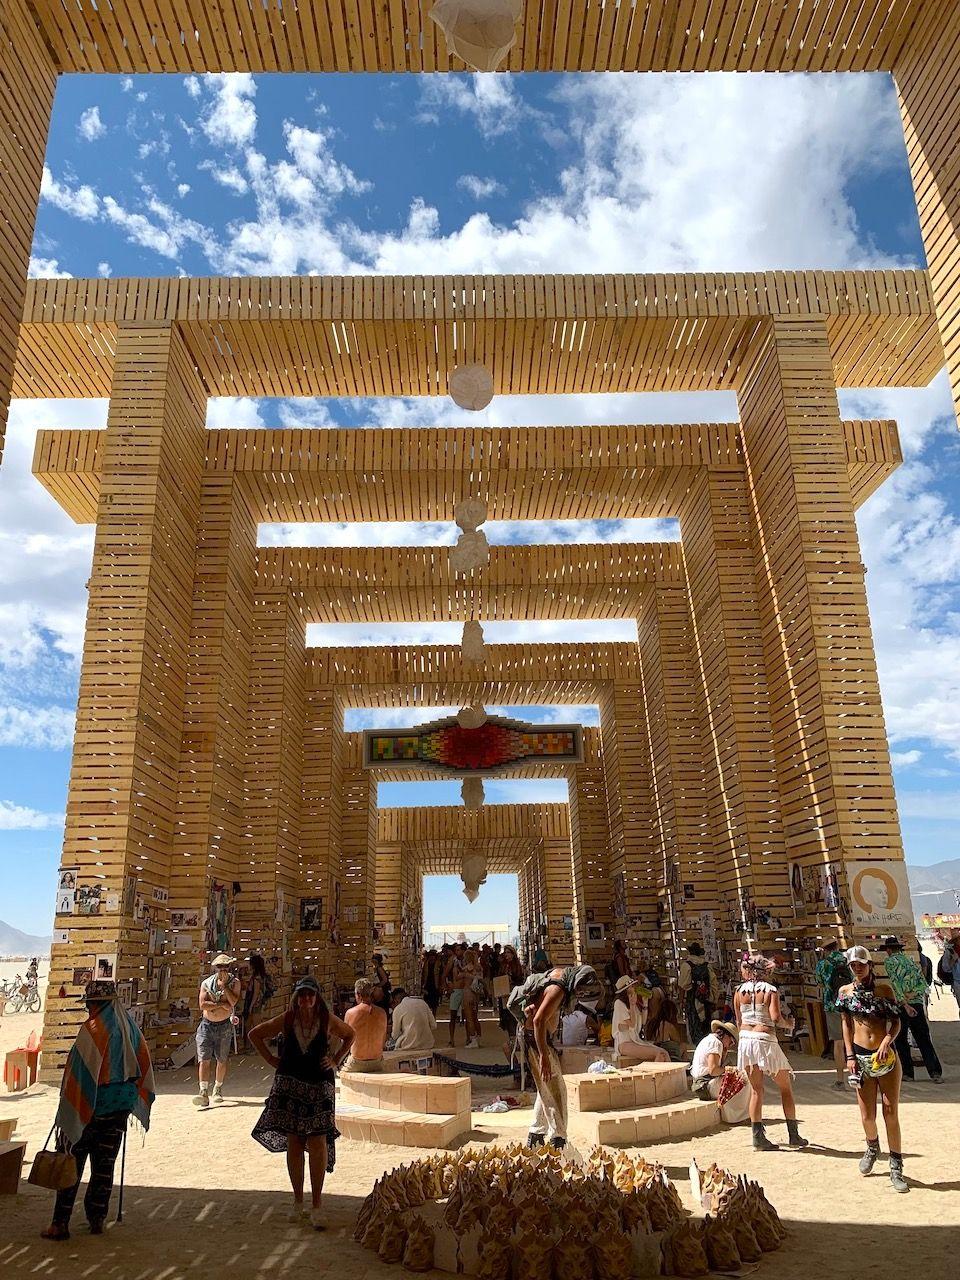 Temple of Direction Art installation Burning Man 2019